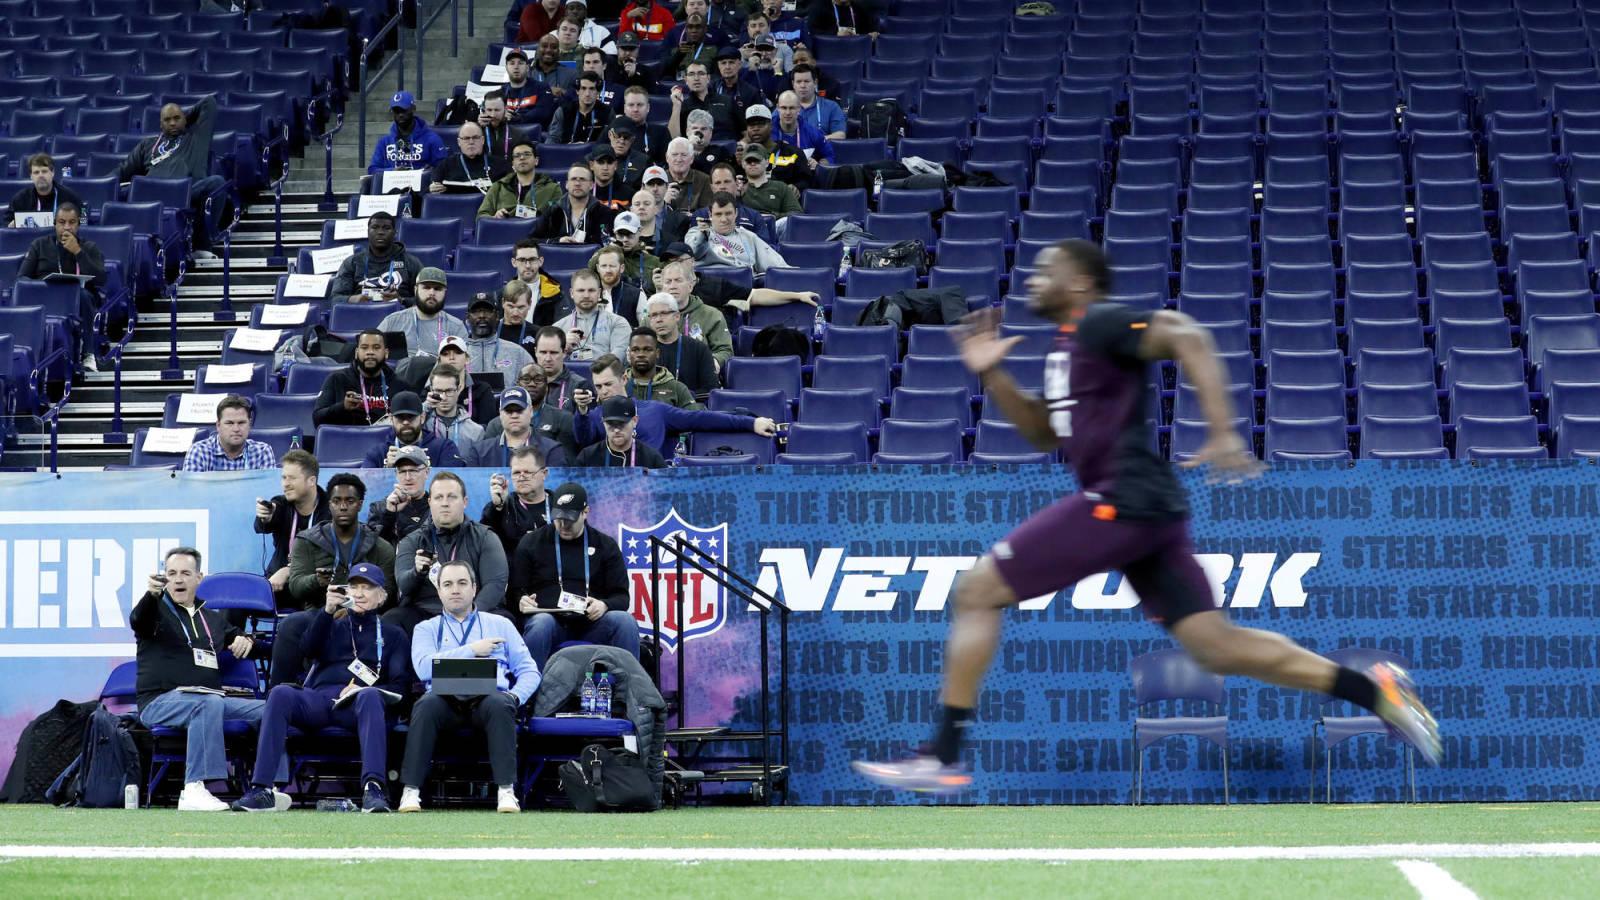 Prime-time combine? No thanks, NFL